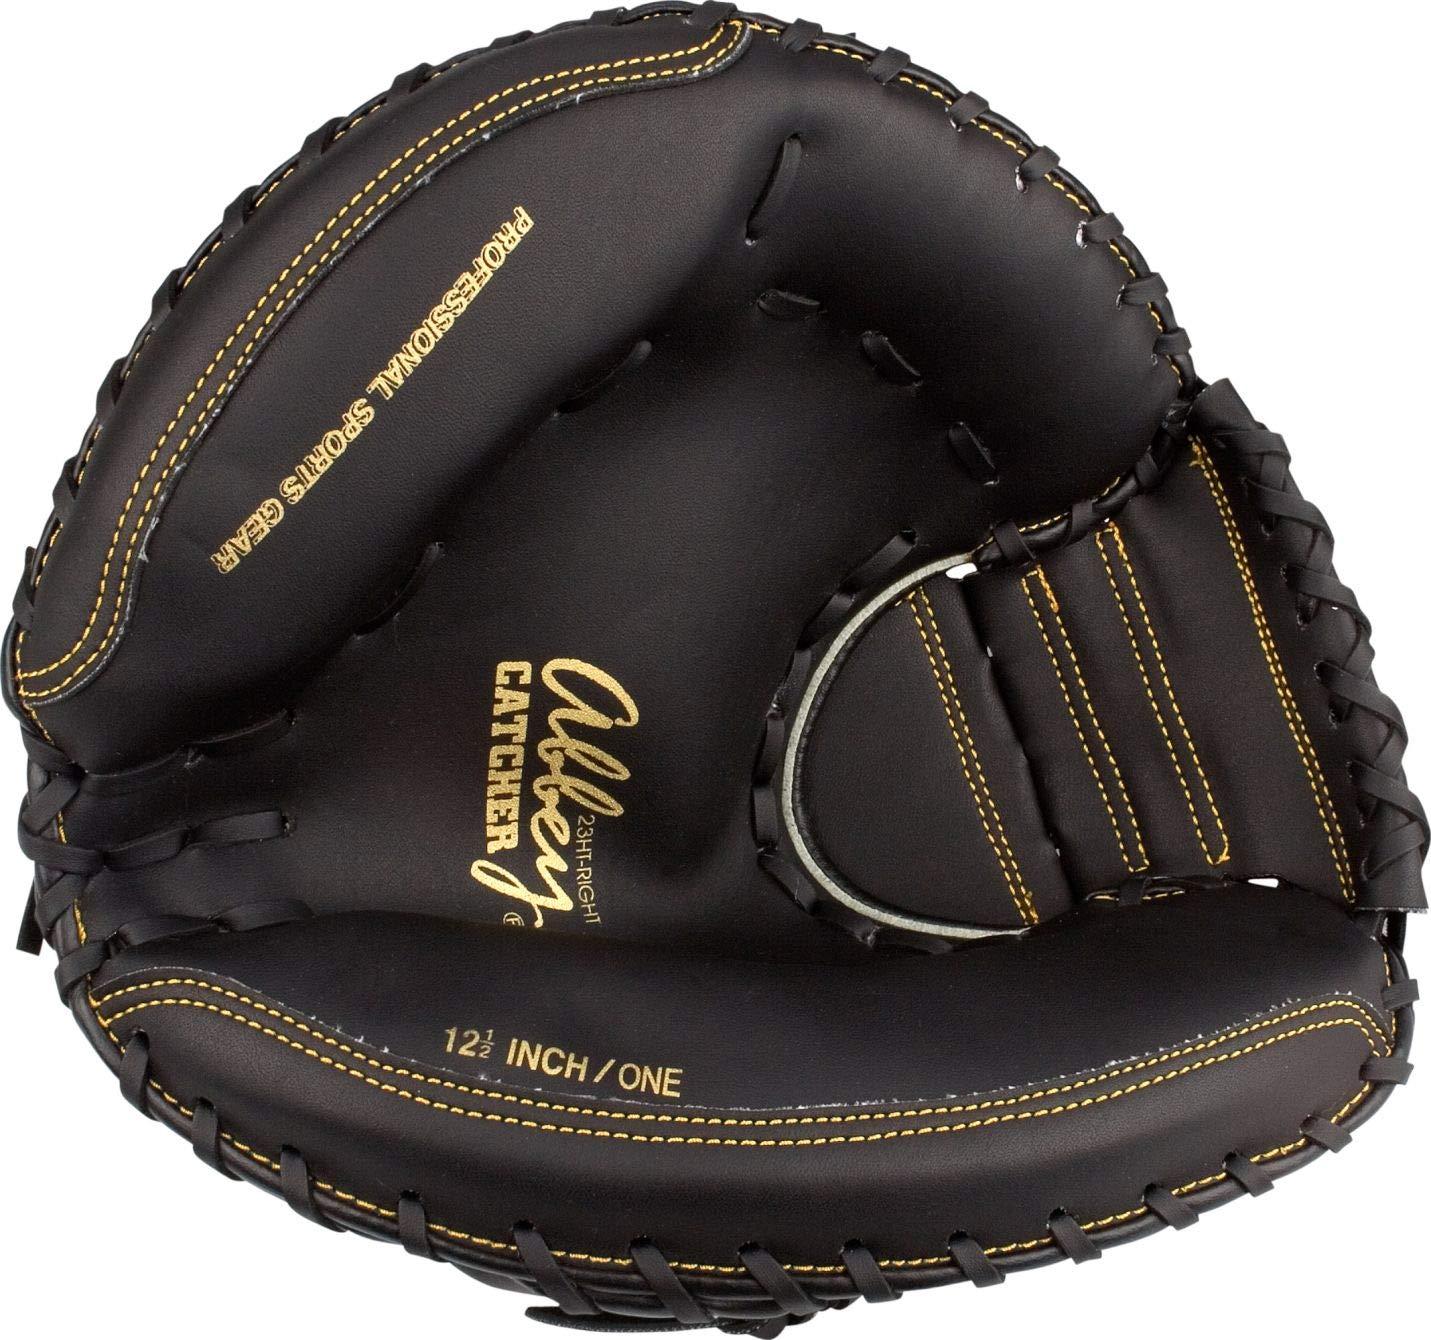 Taille:Rechts Abbey Baseball Gloves Catcher Right Sr Black